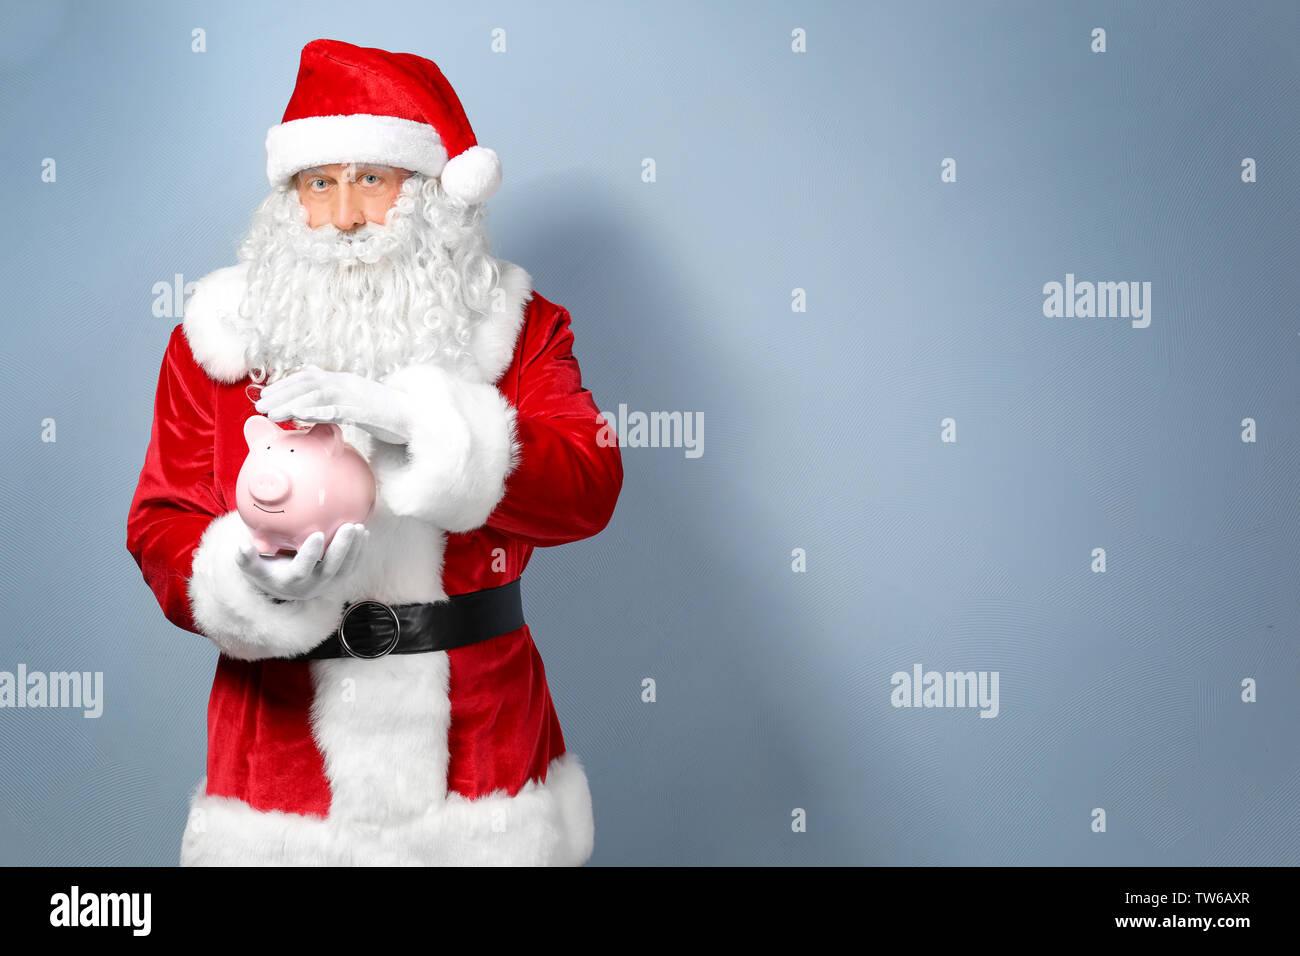 Santa Claus holding piggy bang on light background - Stock Image